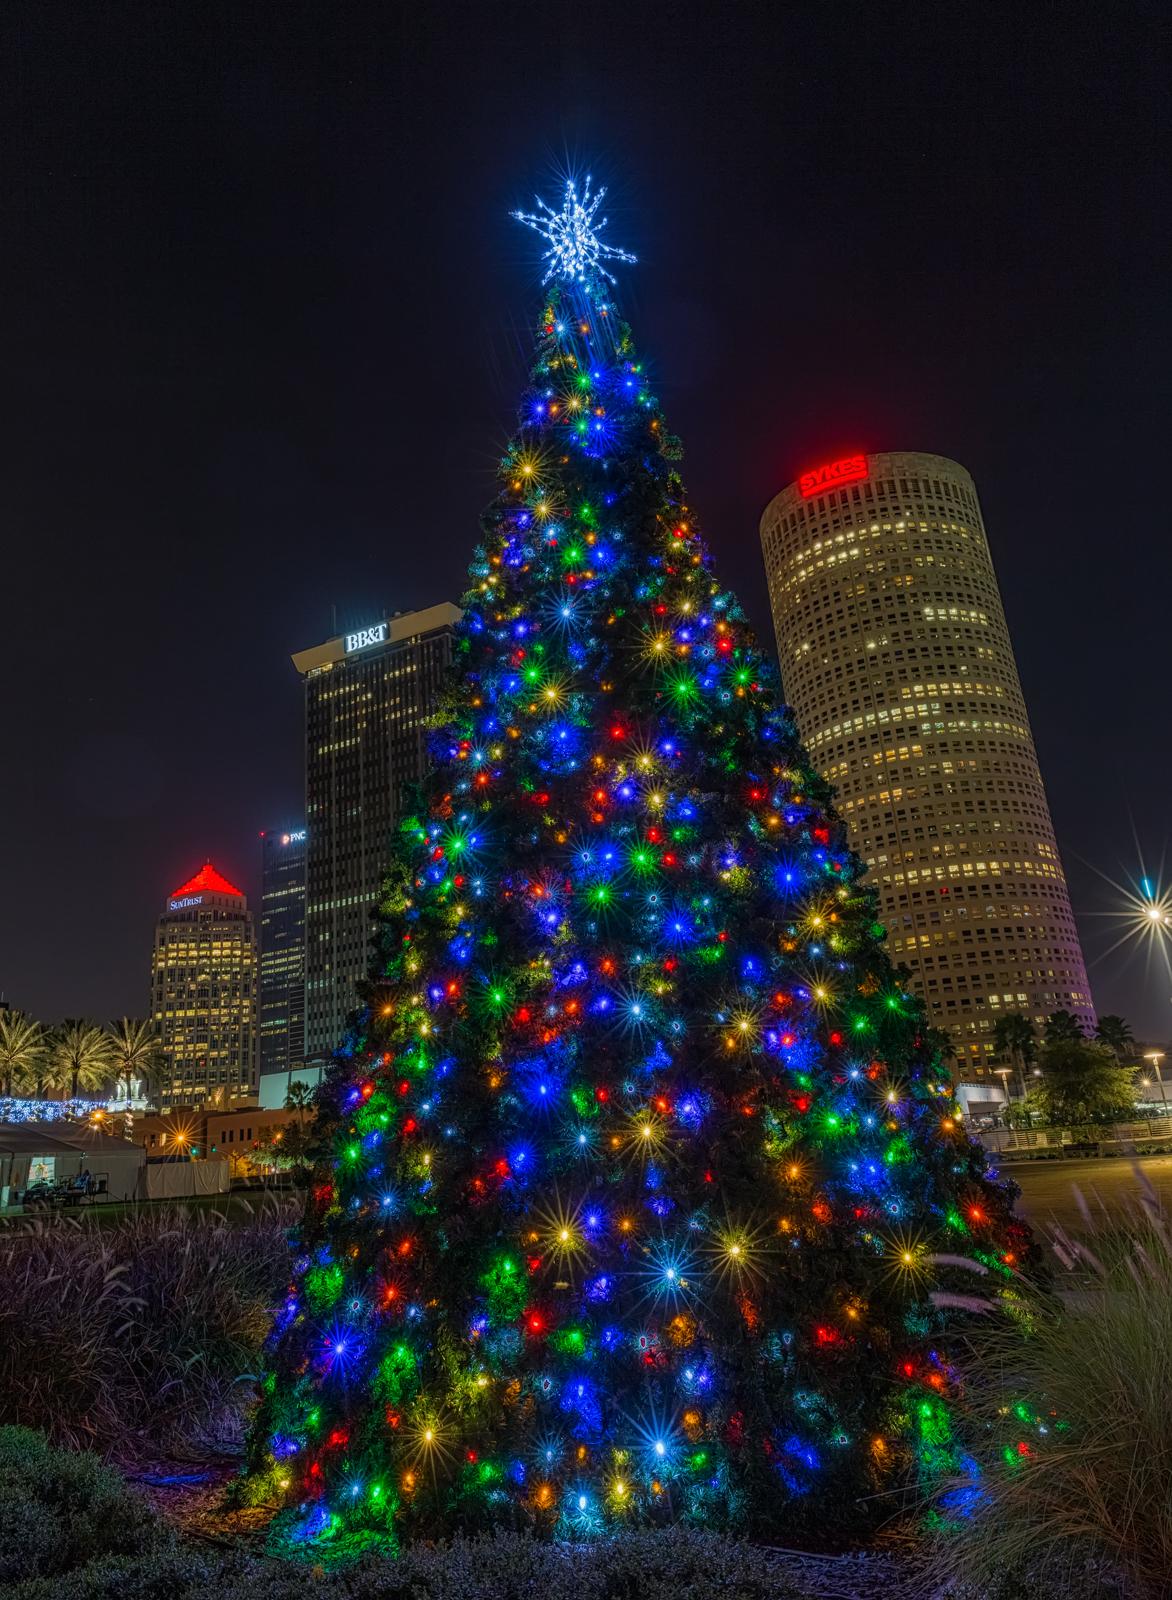 Tampa's Christmas Trees | Matthew Paulson Photography